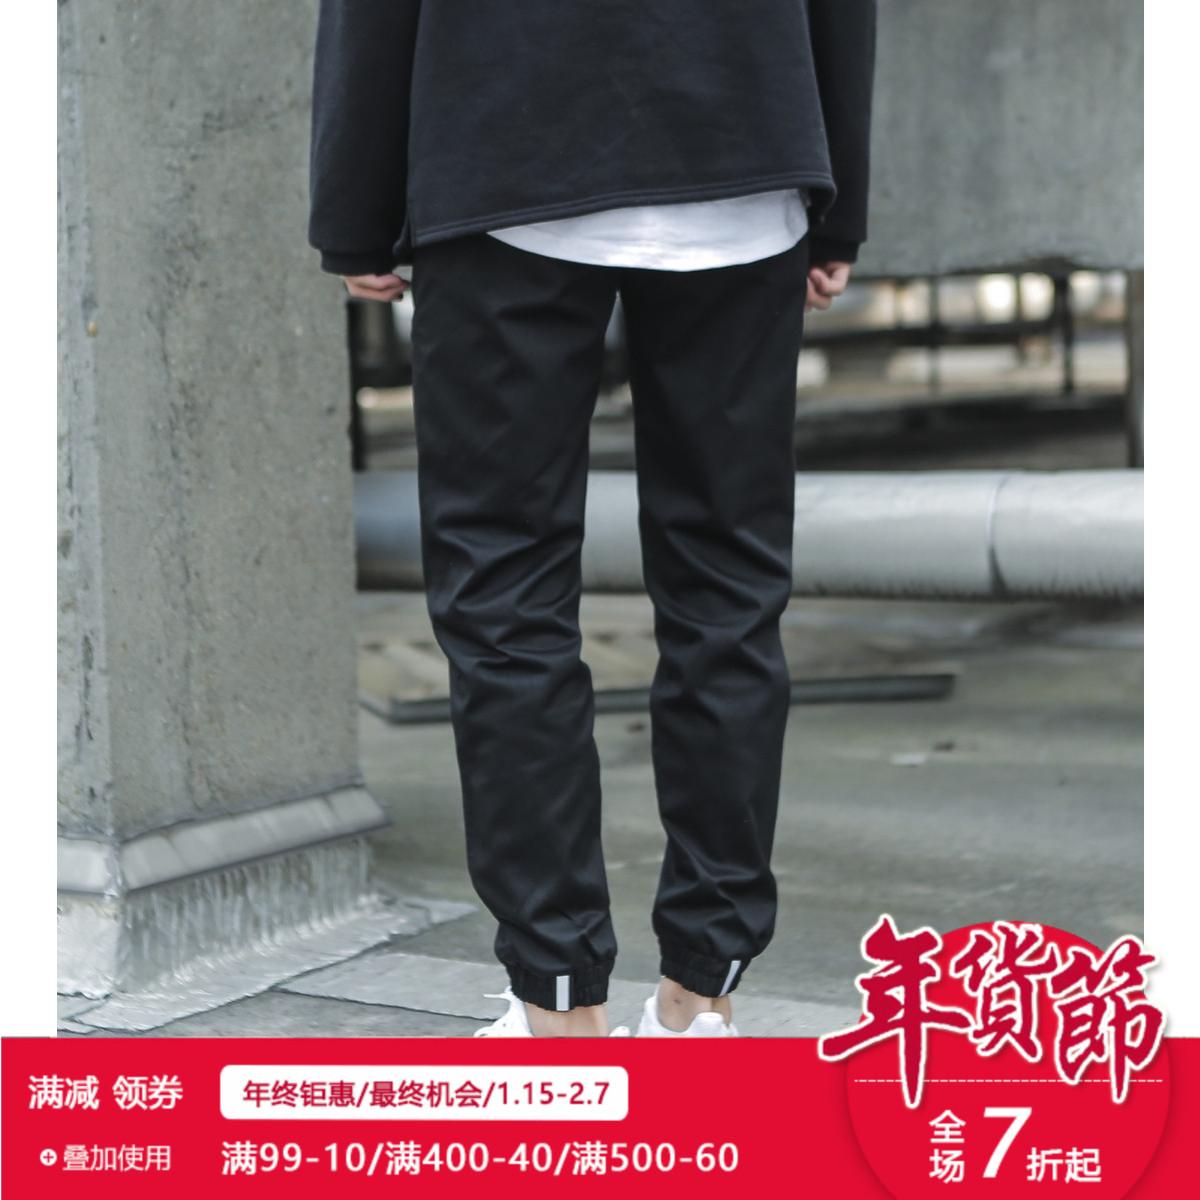 CieloVista潮牌3M反光束脚裤收腿裤口袋工装休闲裤运动卫裤男秋冬